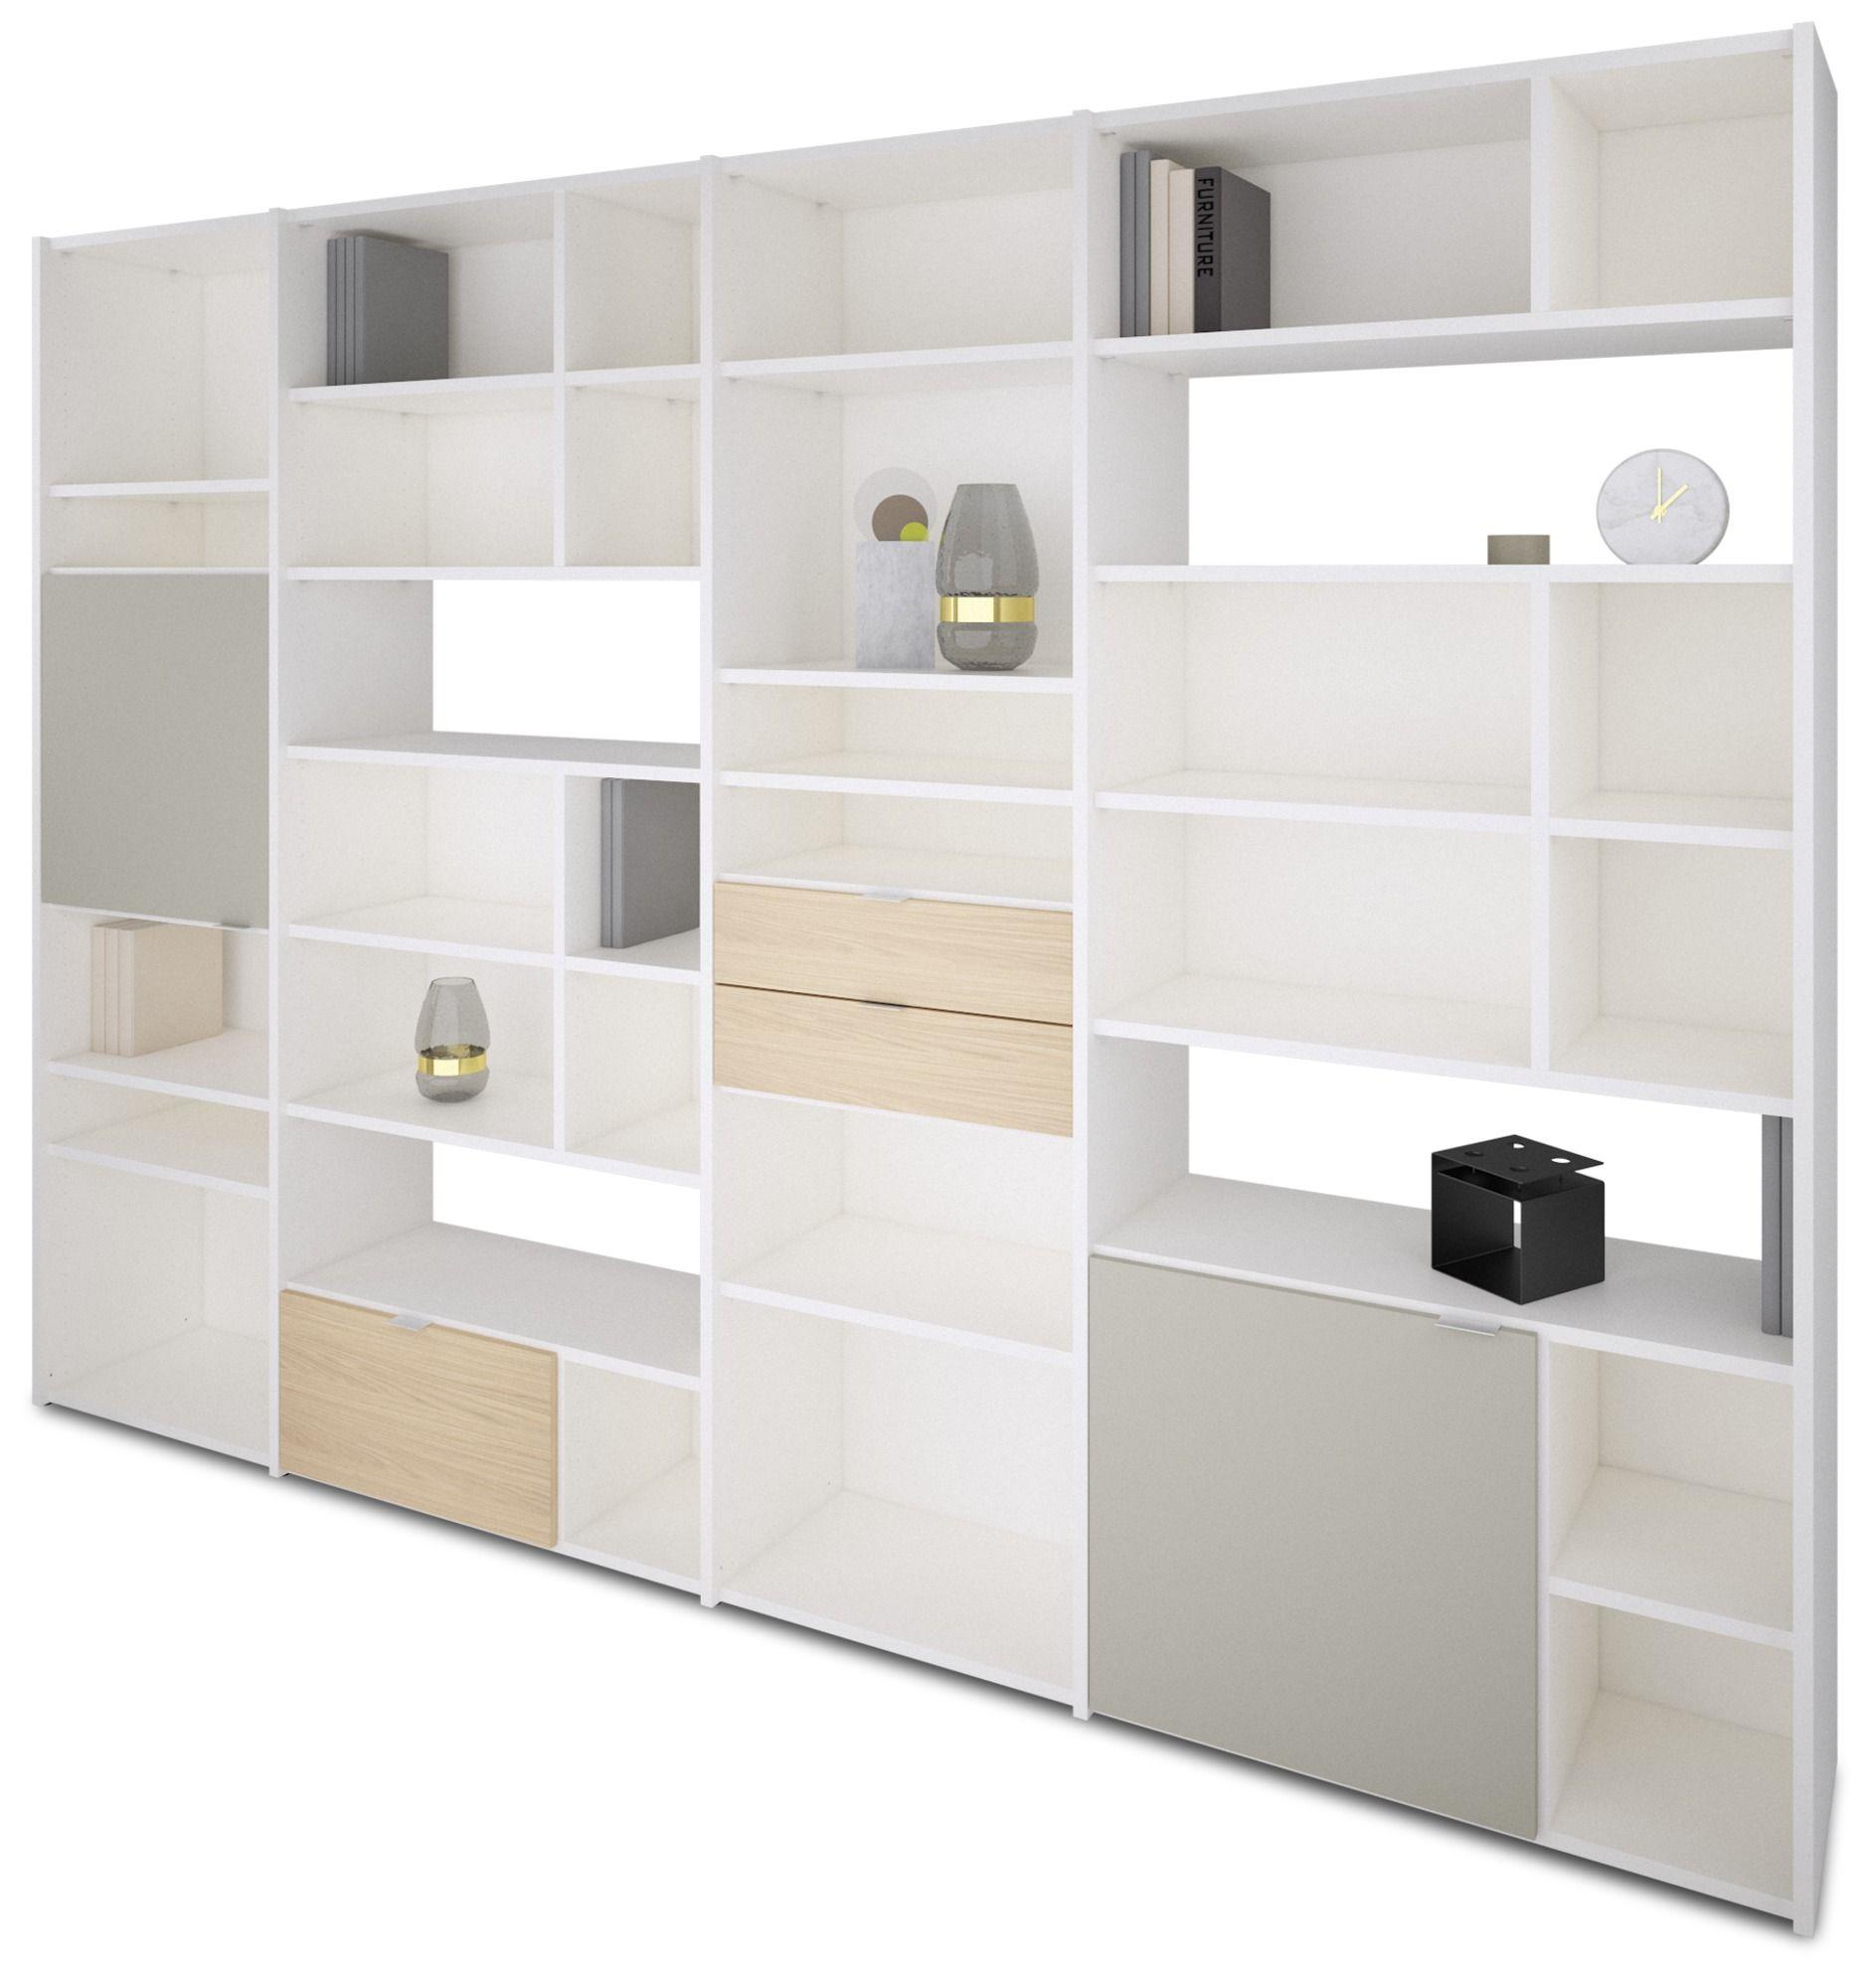 new furniture designs quality from boconcept mid century mod pinterest. Black Bedroom Furniture Sets. Home Design Ideas